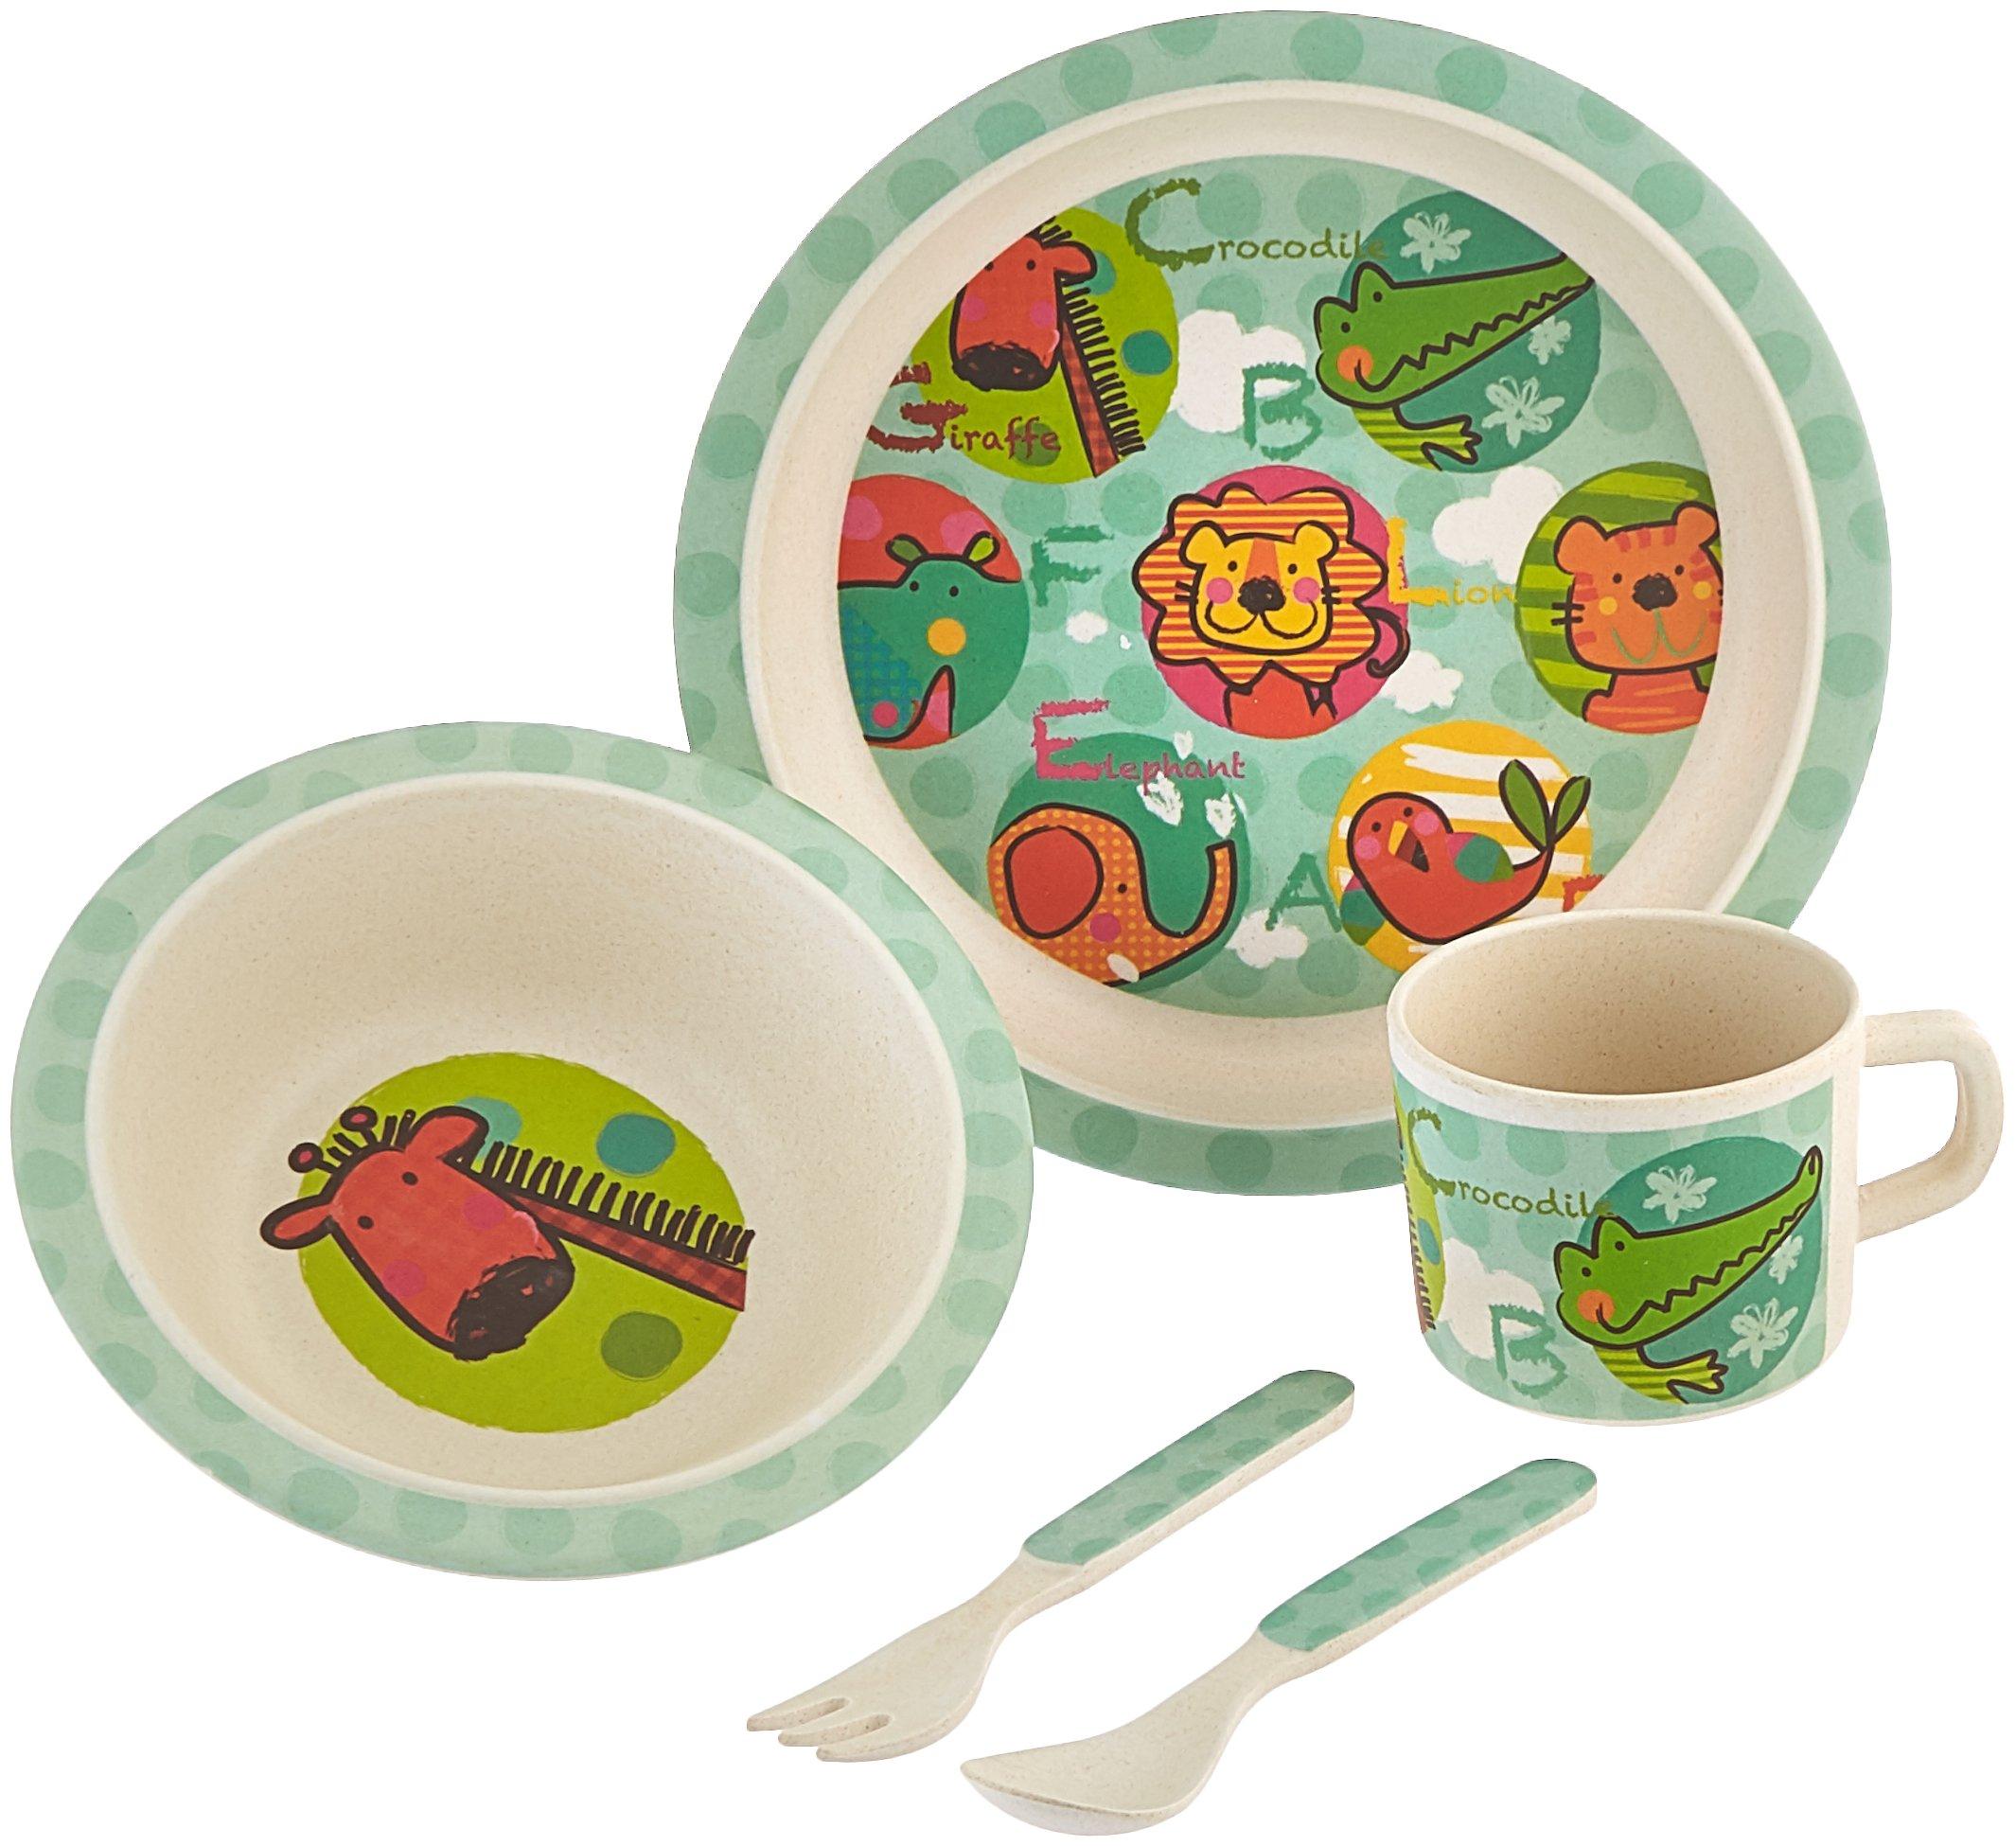 Culina Kids Bamboo 5-piece Dinnerware Set - Jungle Animals  sc 1 st  Amazon.com & Amazon.com : Culina Kids Bamboo 5-piece Dinnerware Set - Butterfly ...